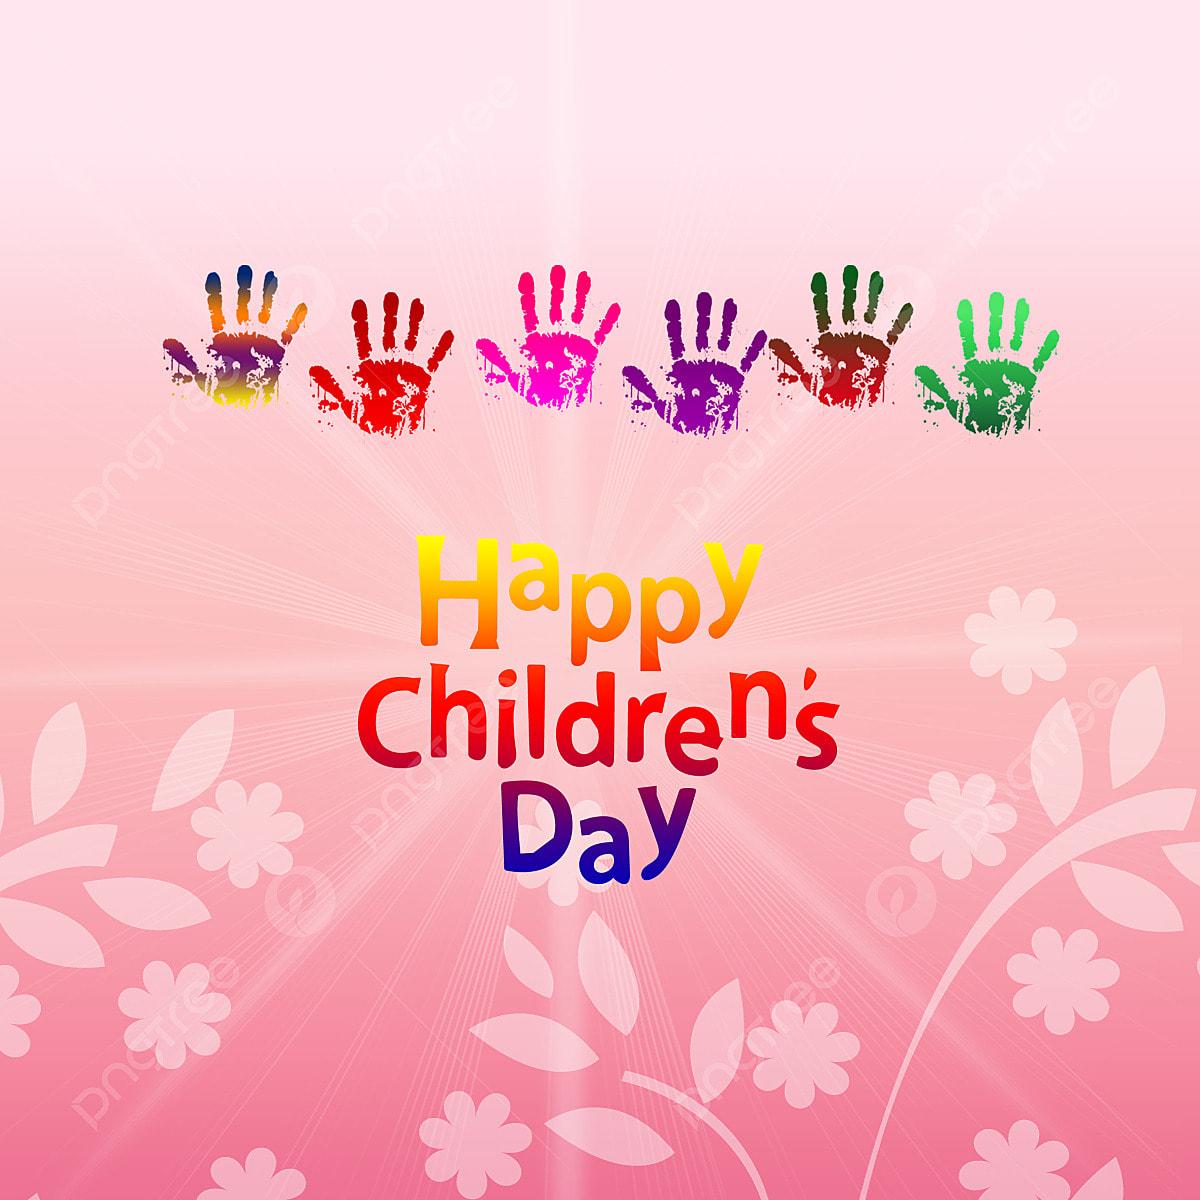 dlf celebrate childrens day - 640×640